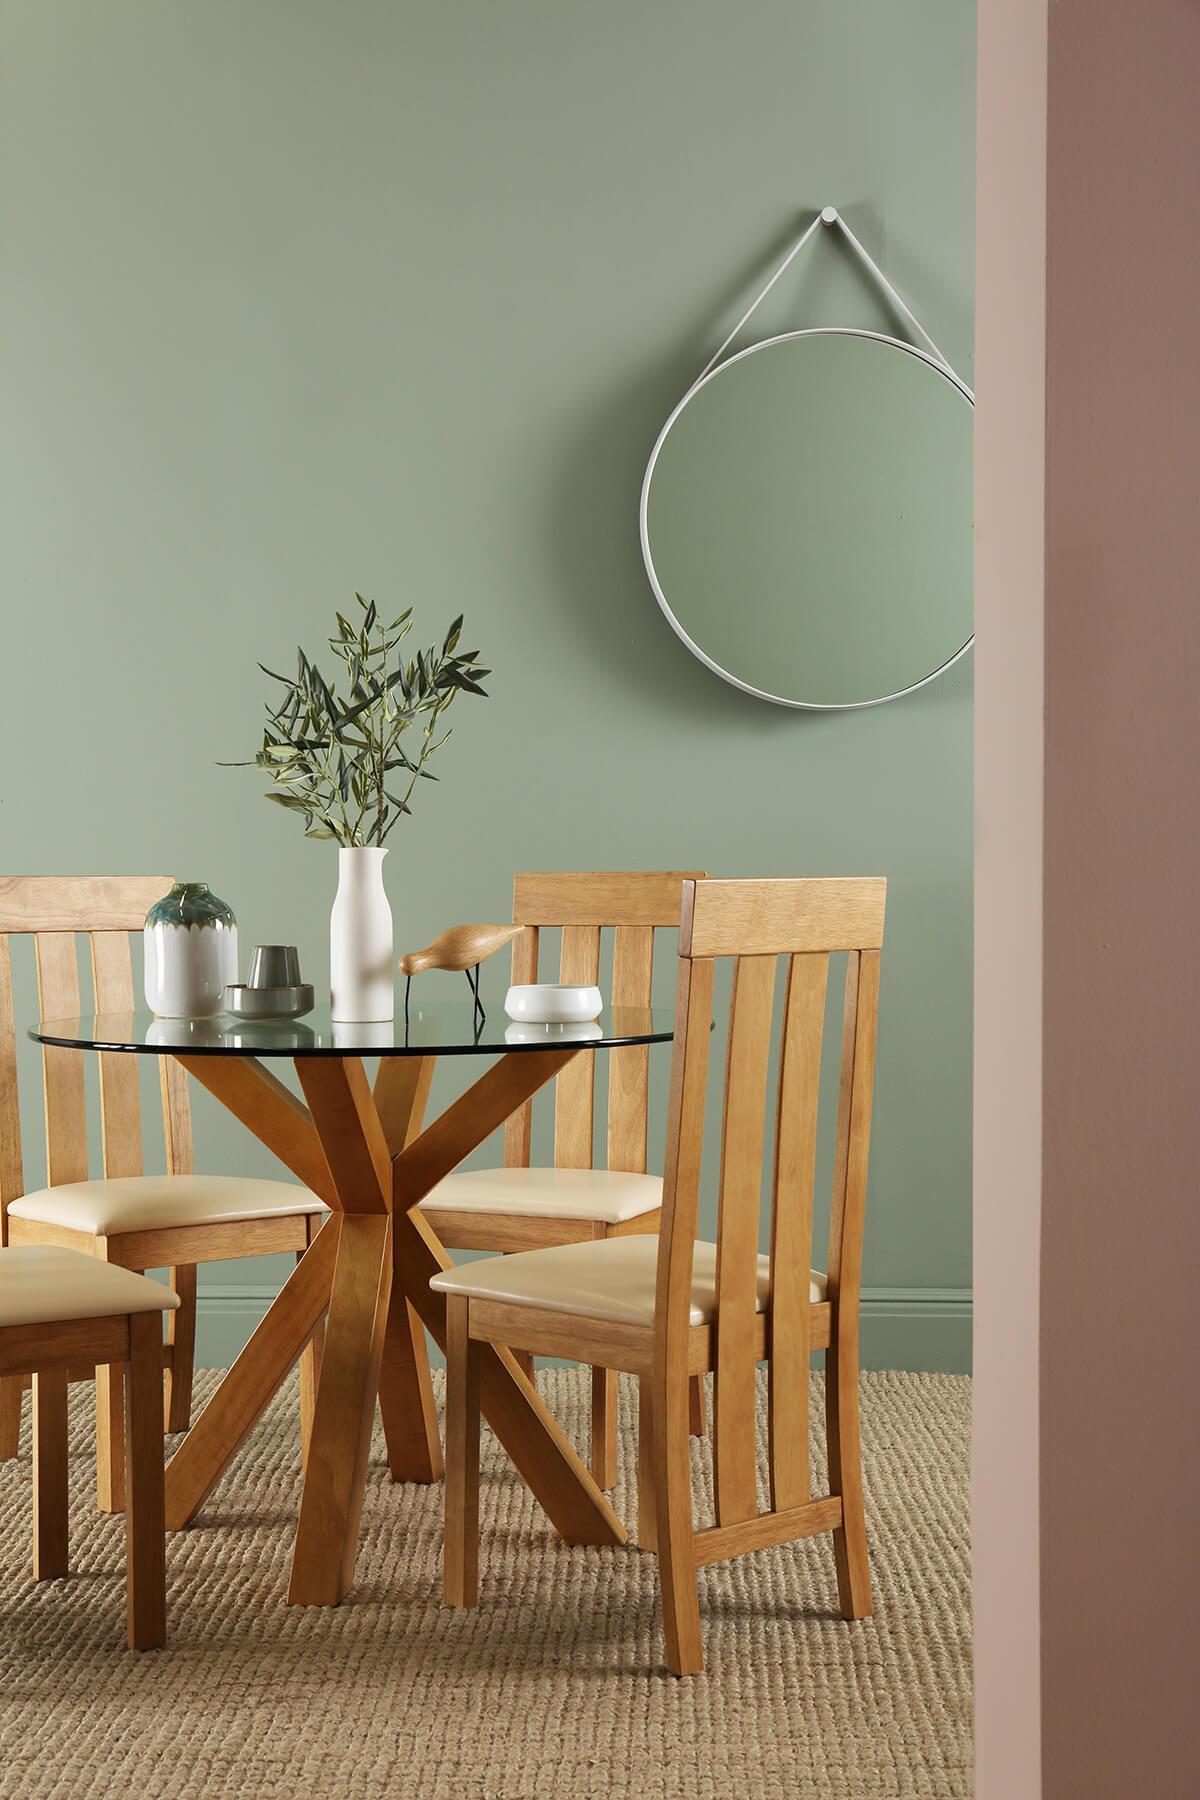 Hatton oak and glass Chester oak chairs portrait